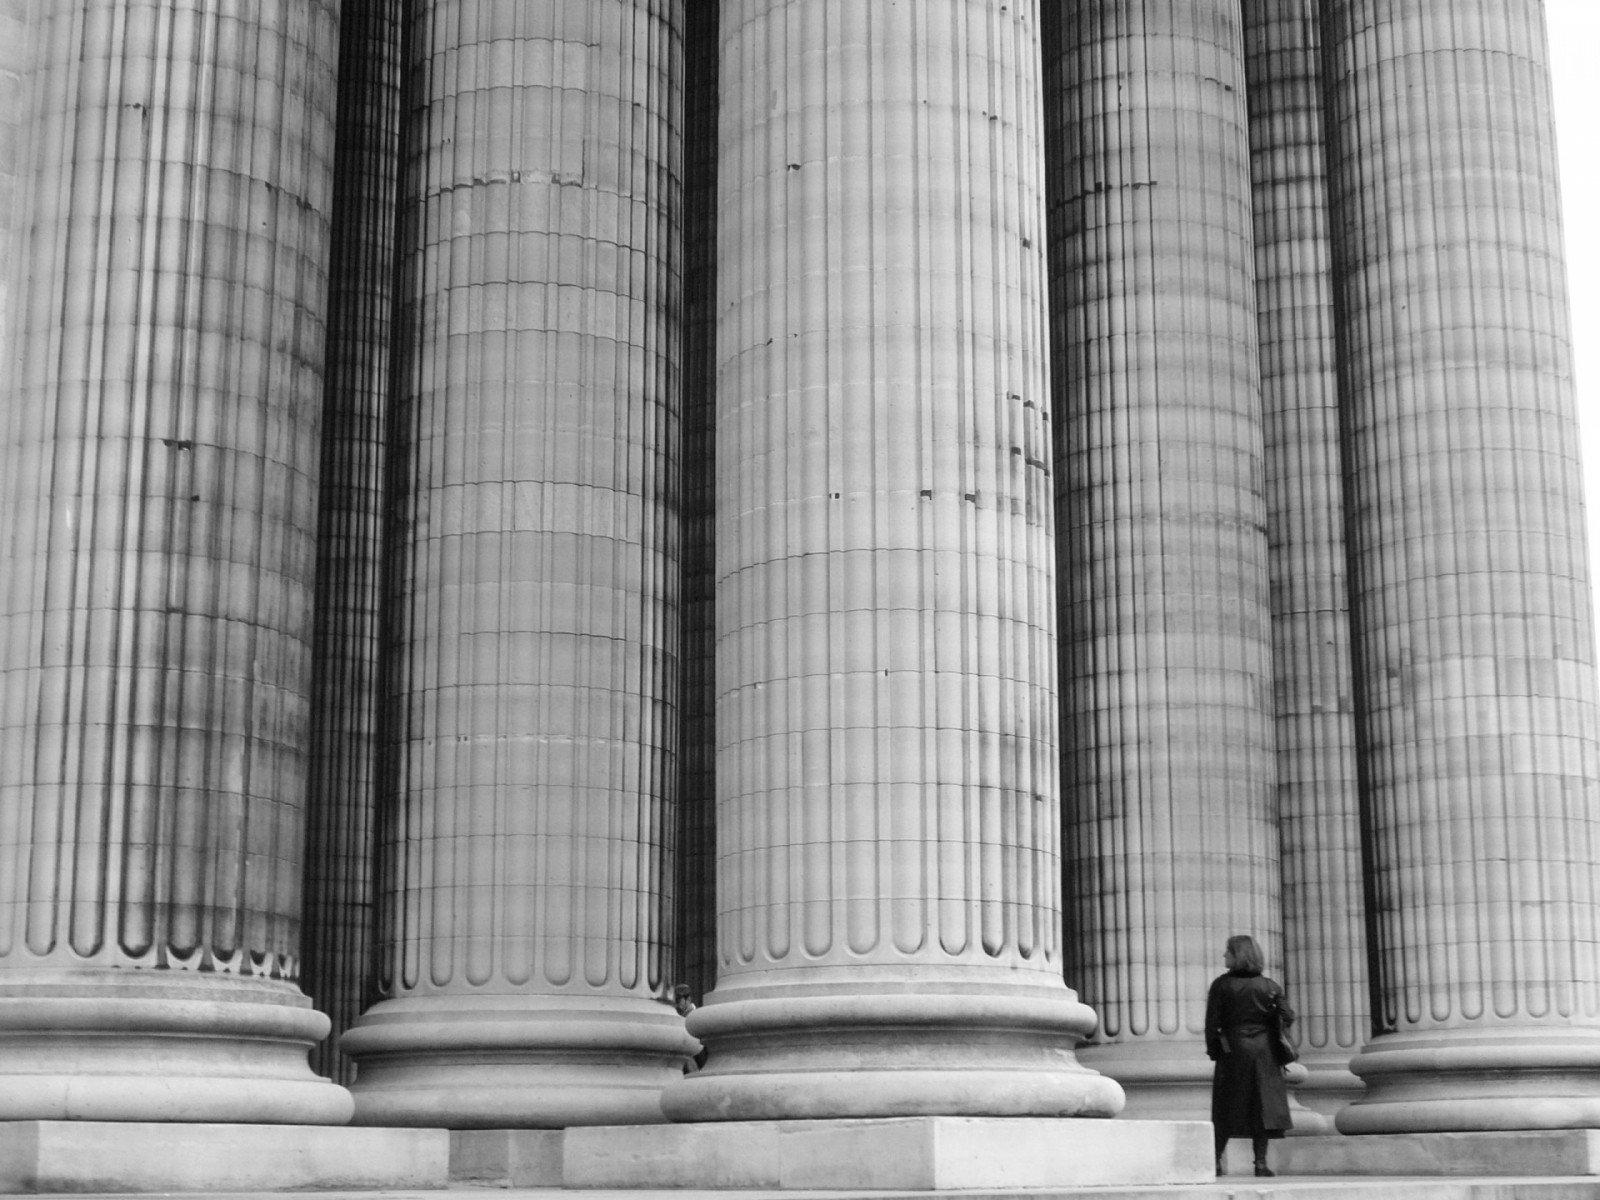 pillar-architecture-column-design-stone-classical